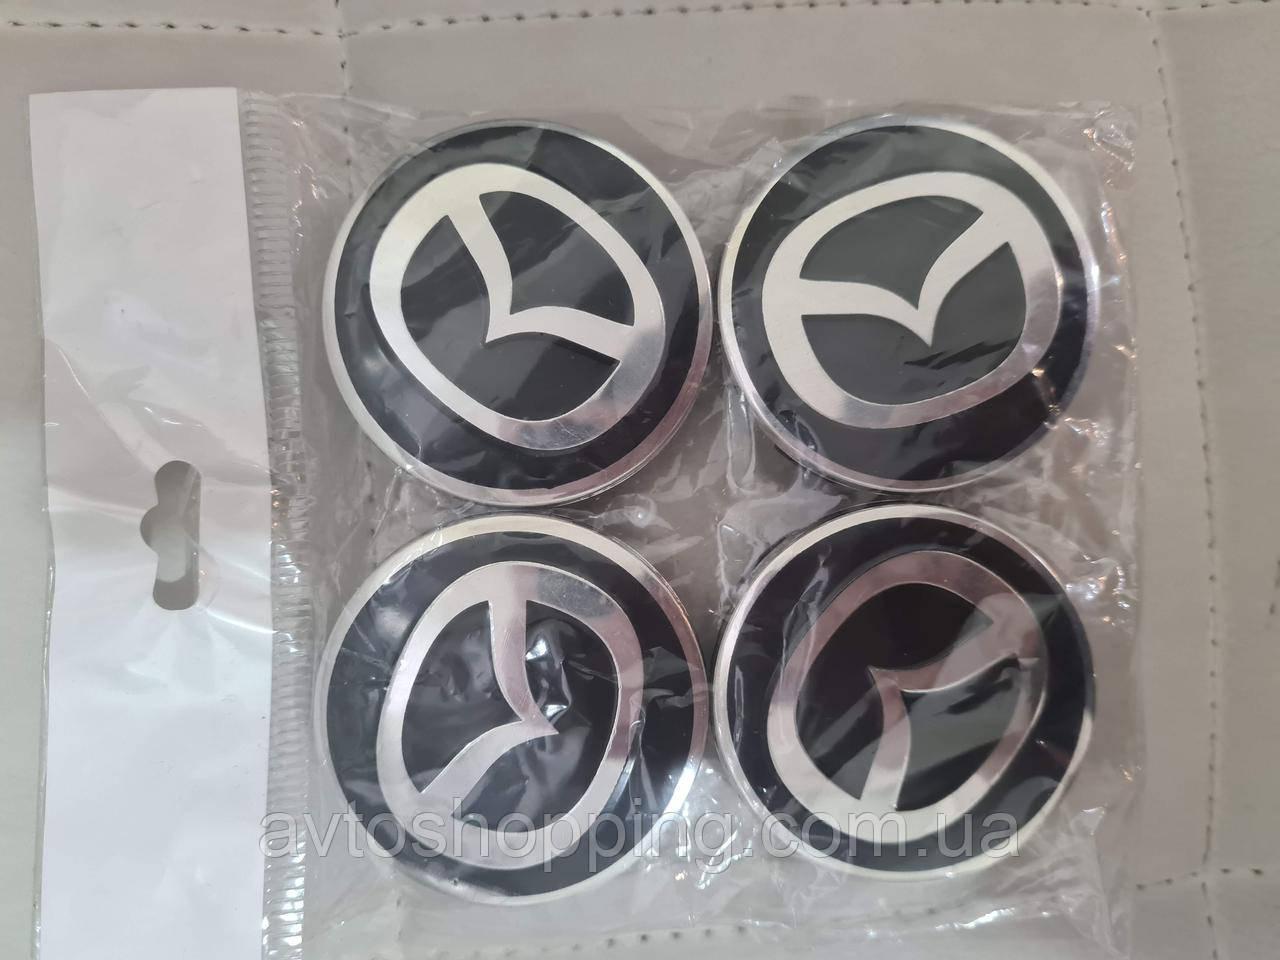 Ковпачки, заглушки на диски , Мазда Mazda 60 мм / 56 мм